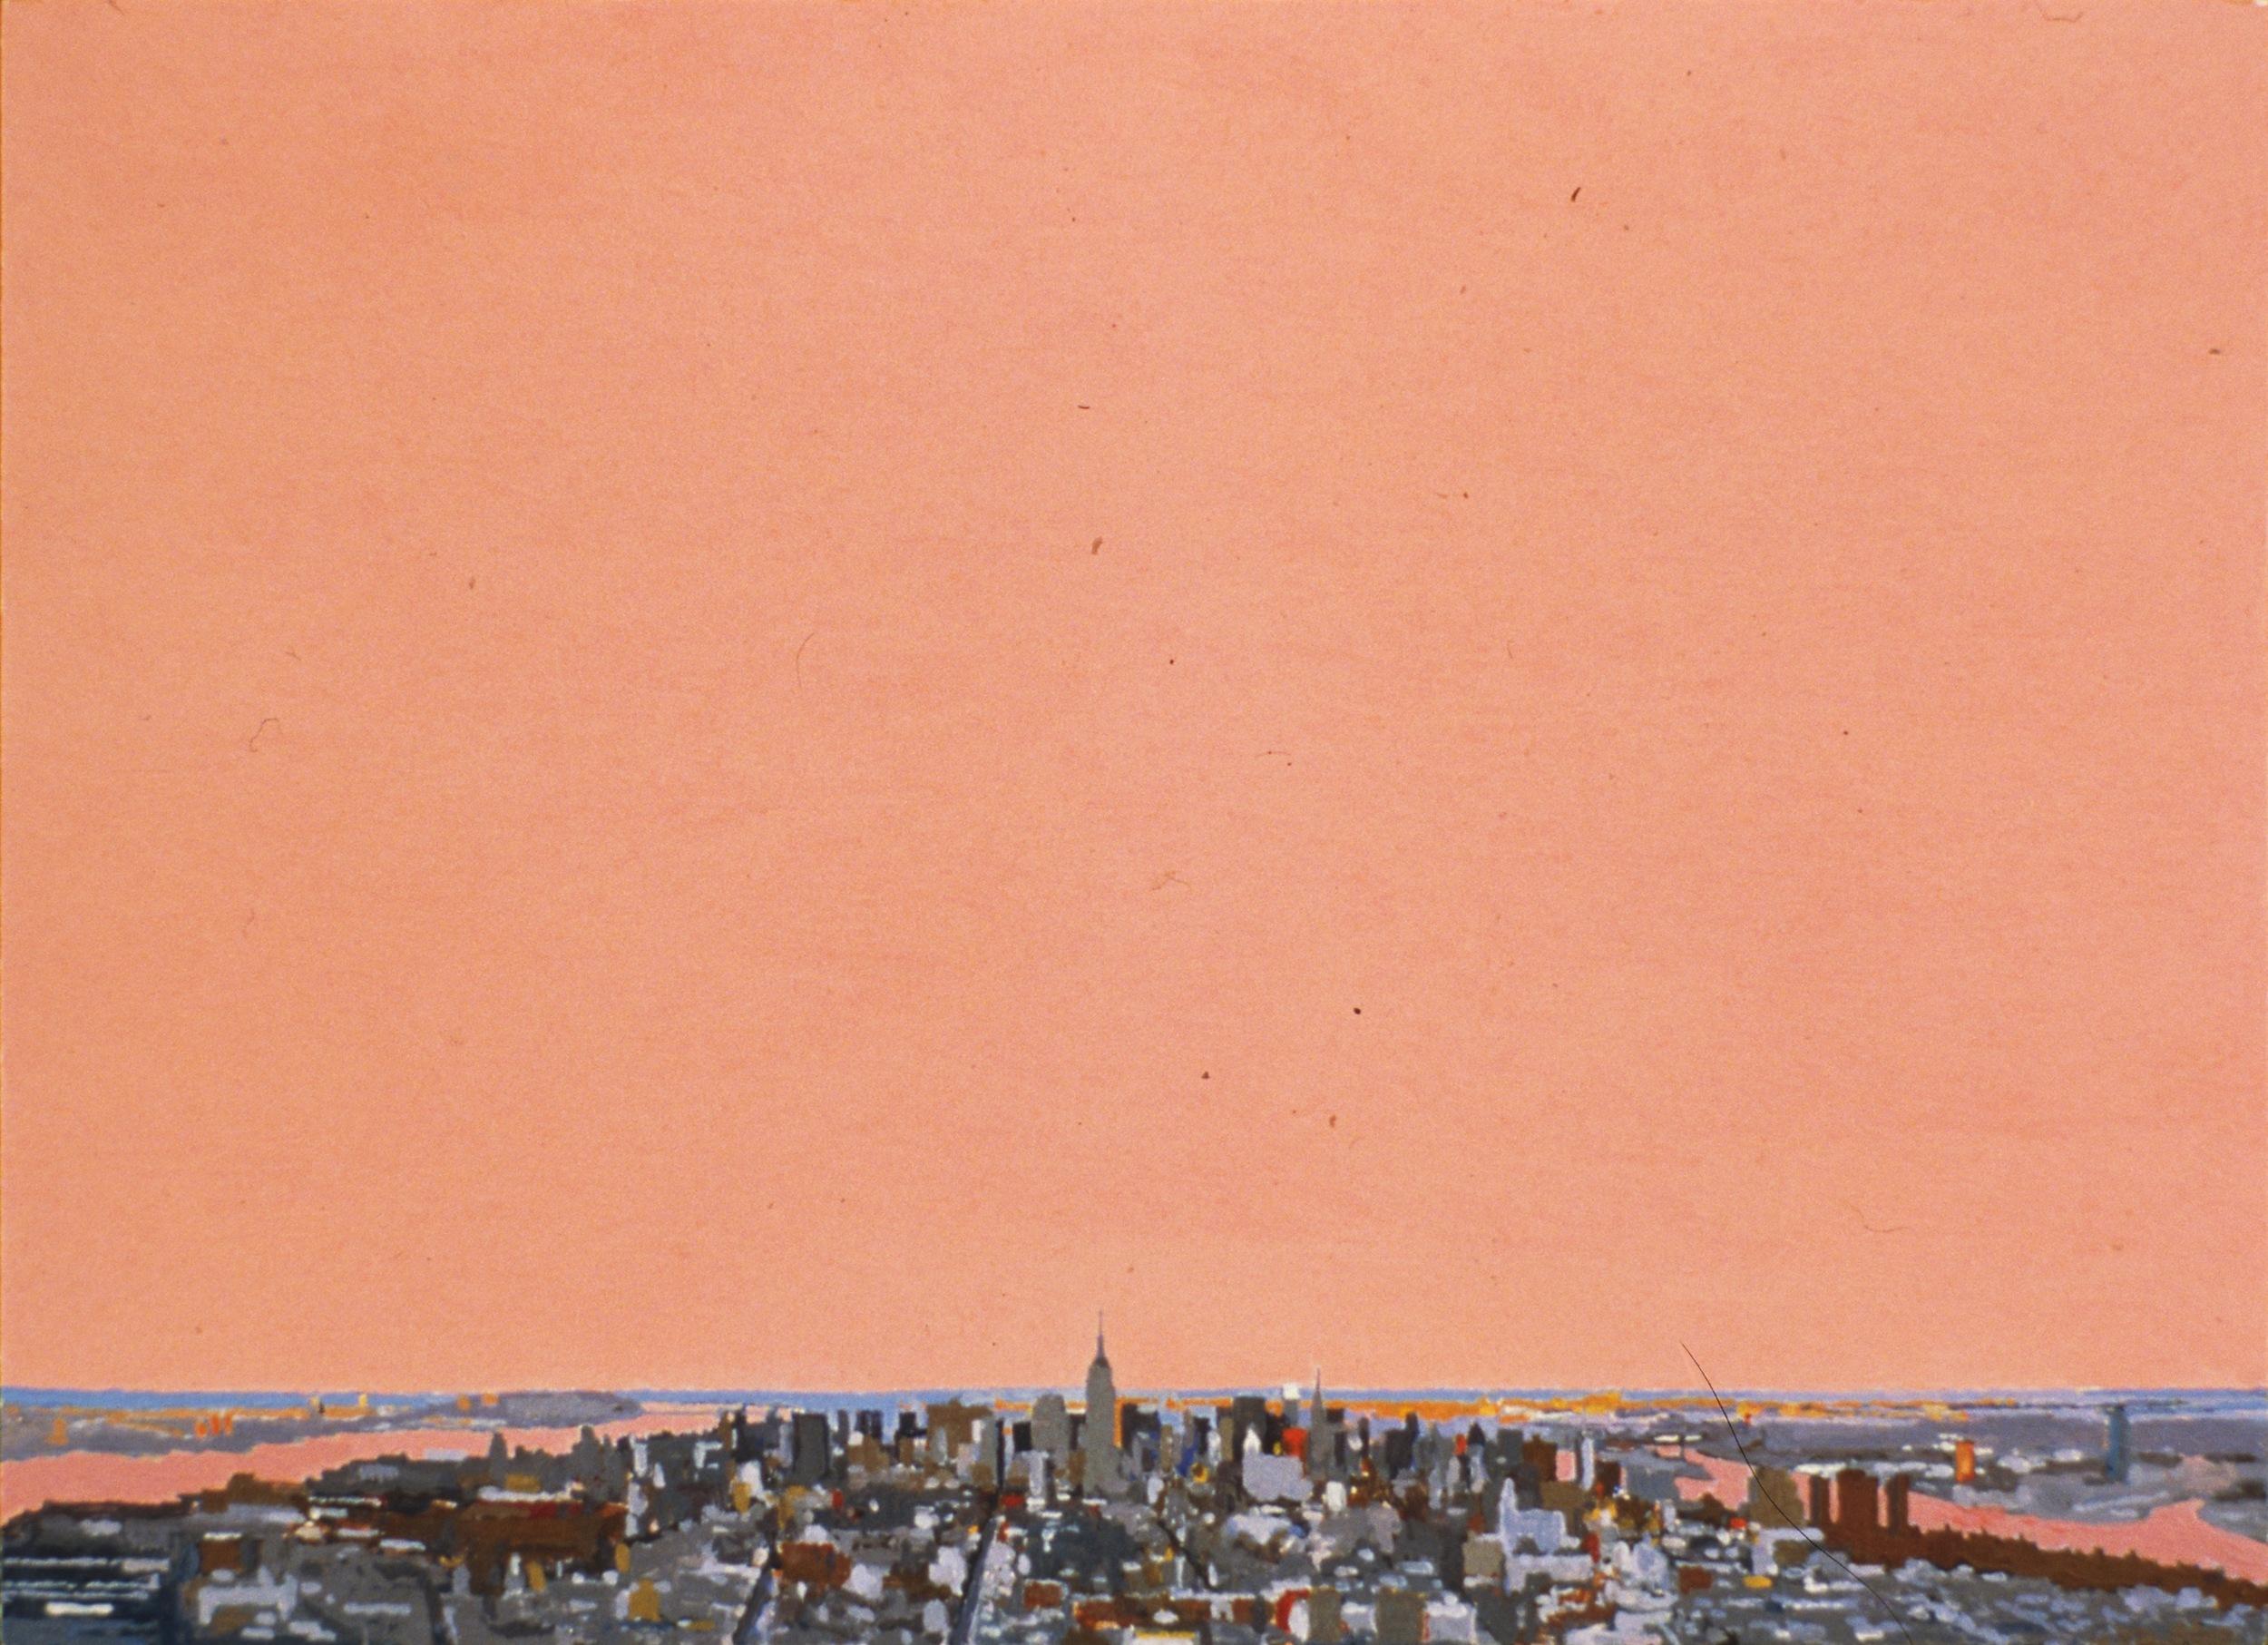 Manhattan II, 1998, oil on panel, 8 x 11 inches